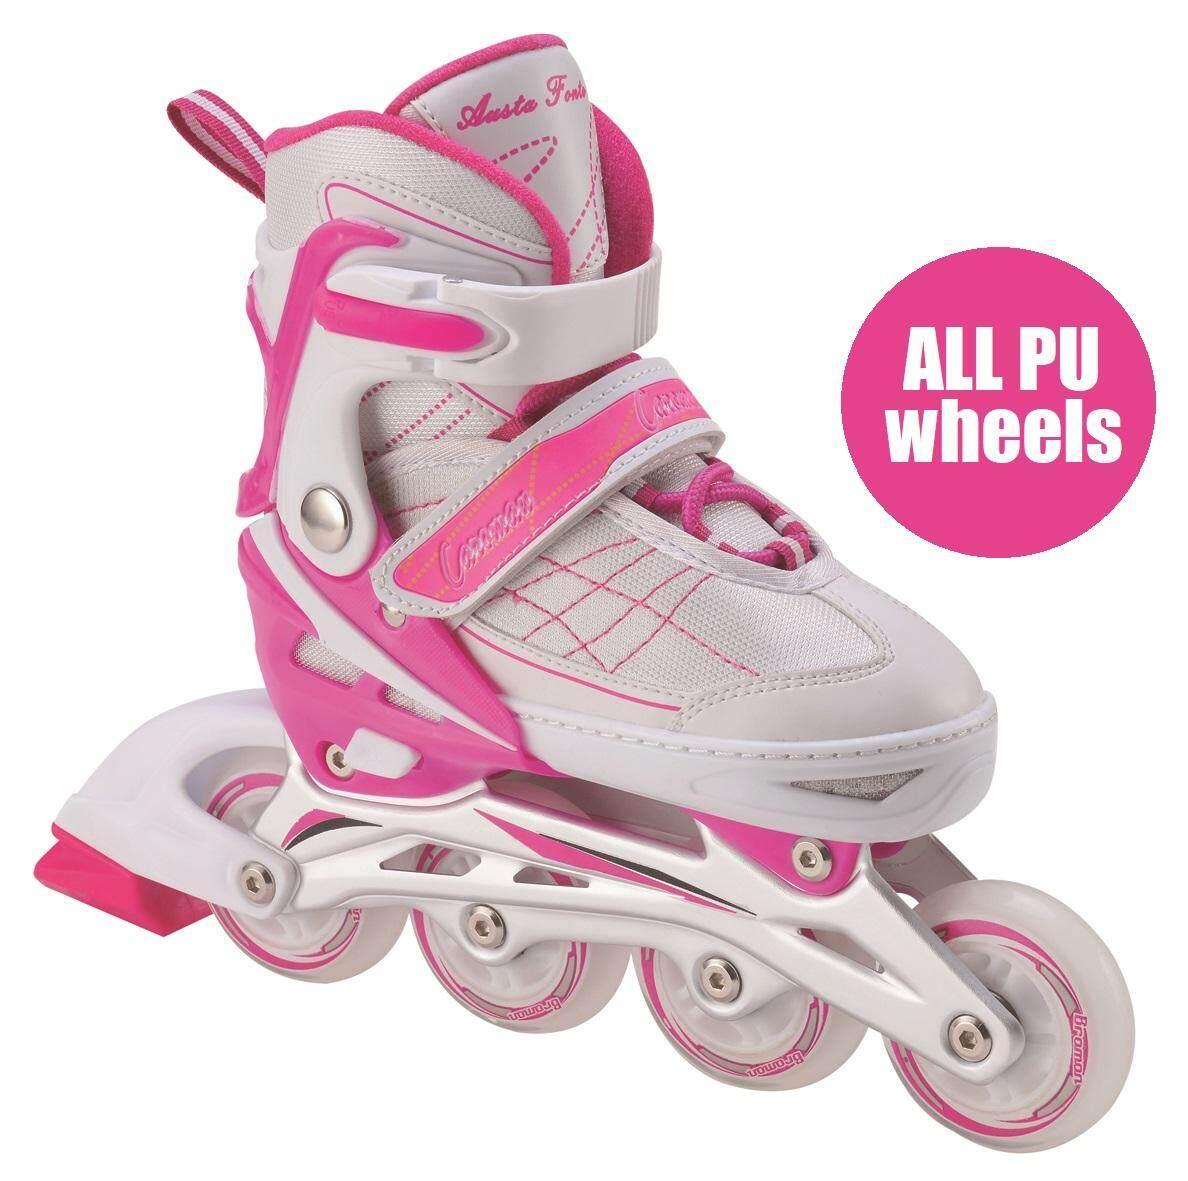 Kids   Adult Rollerblade Inline Skate + PU Flash Wheel Adjustable Shoe  Roller Blade Kasut Roda 7396d9f063